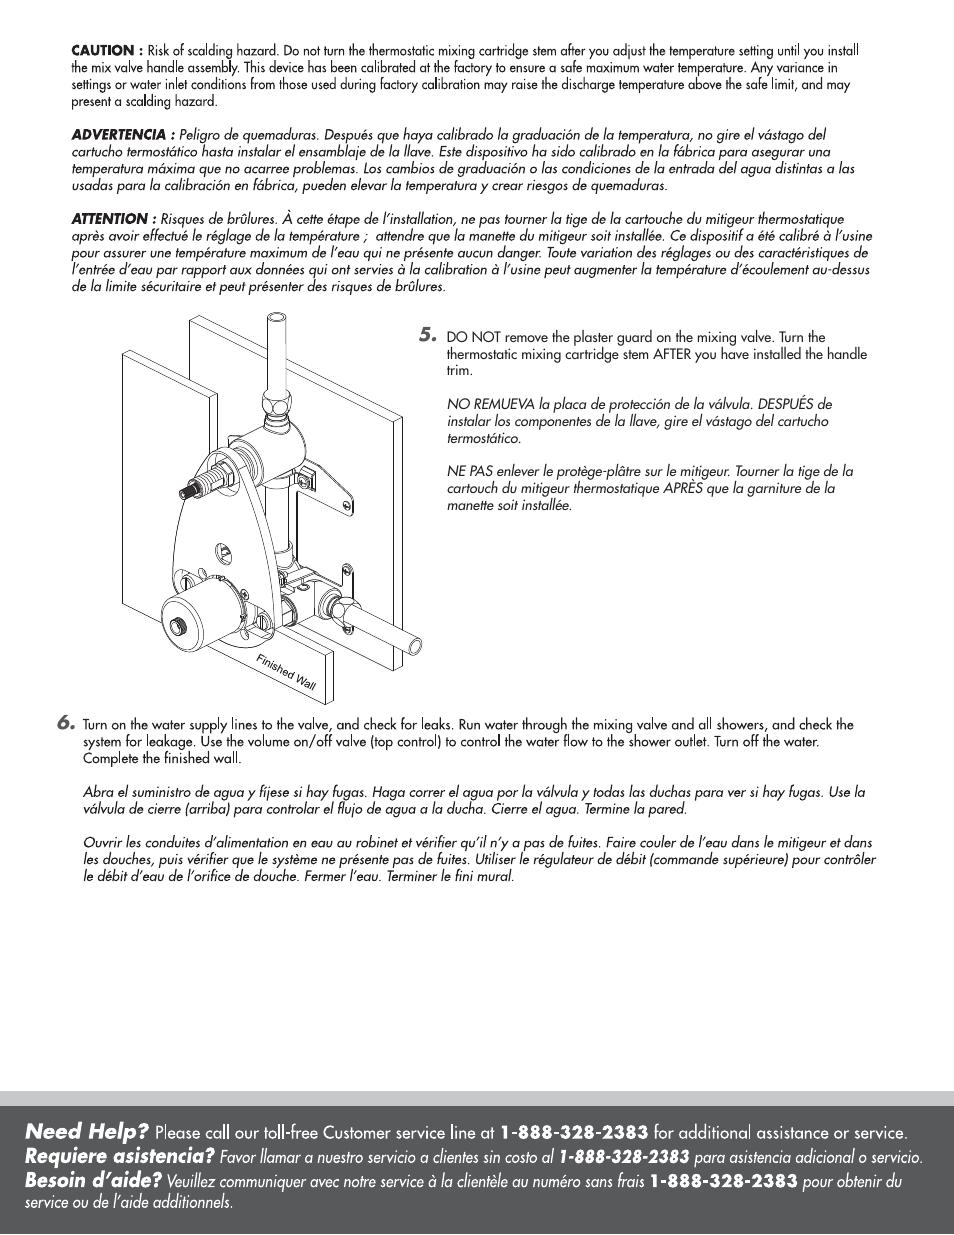 Danze D151000BT - Installation Manual User Manual | Page 7 / 8